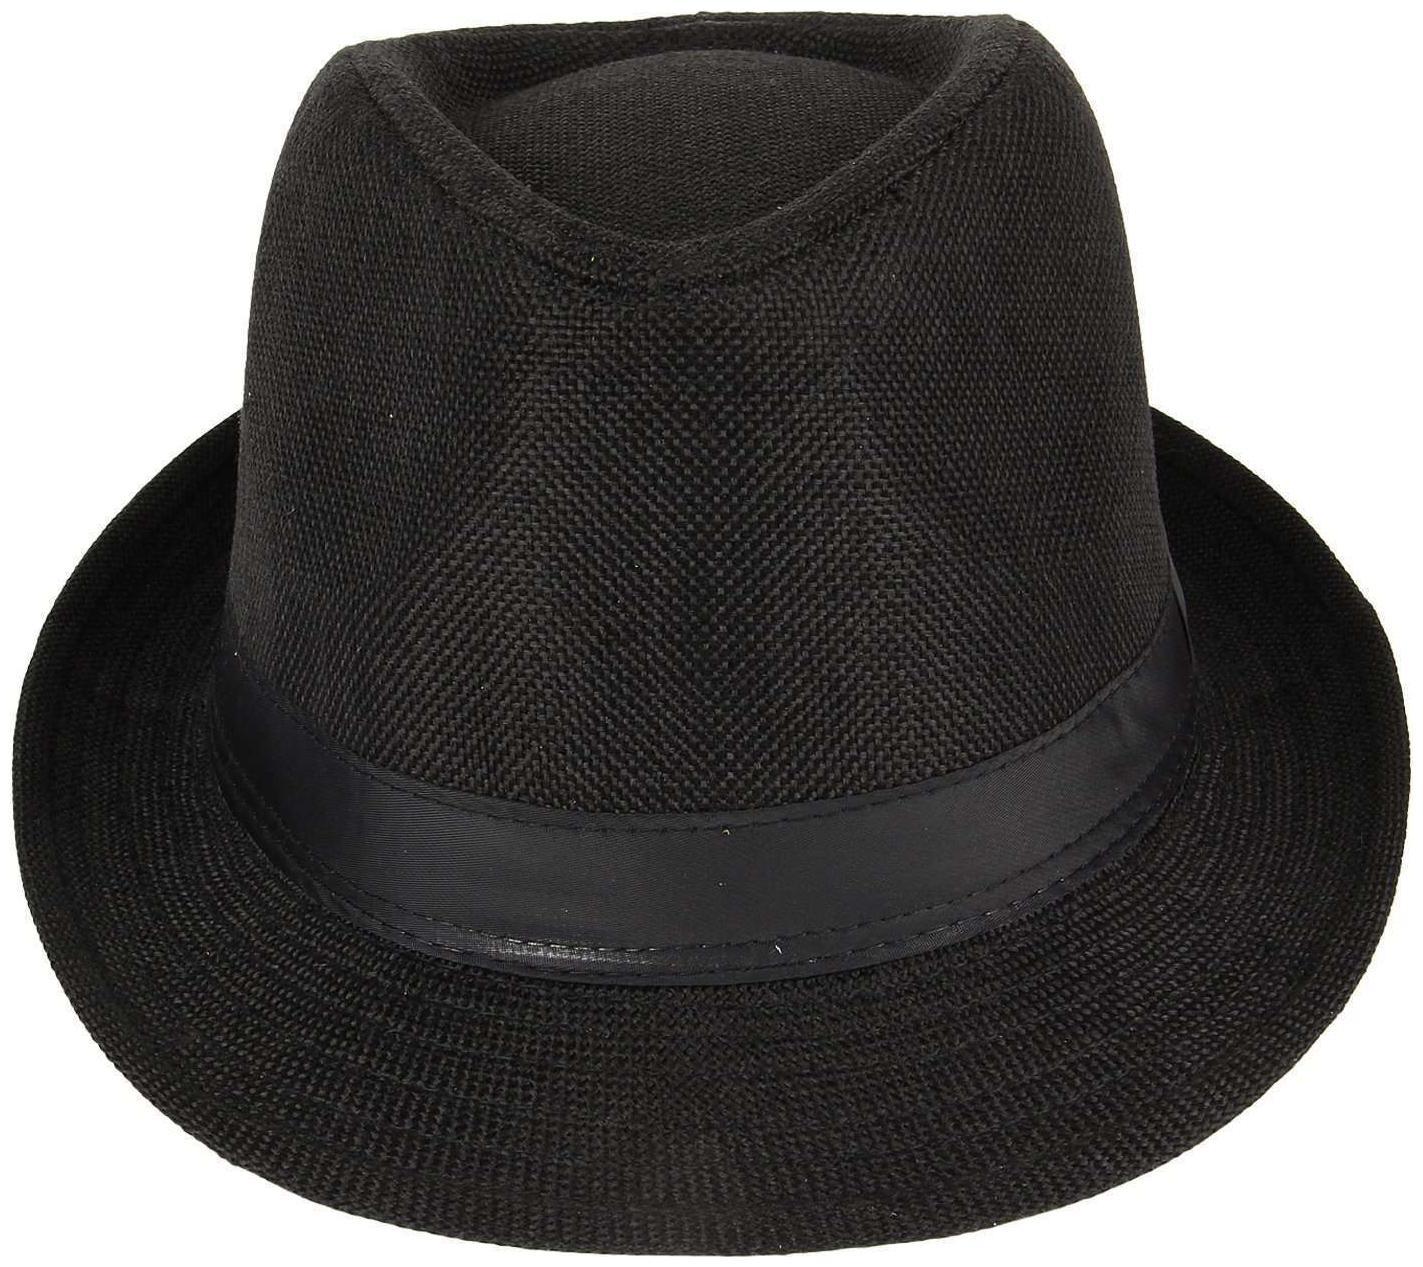 Jubination Boy's Black Cotton Fedora Hat